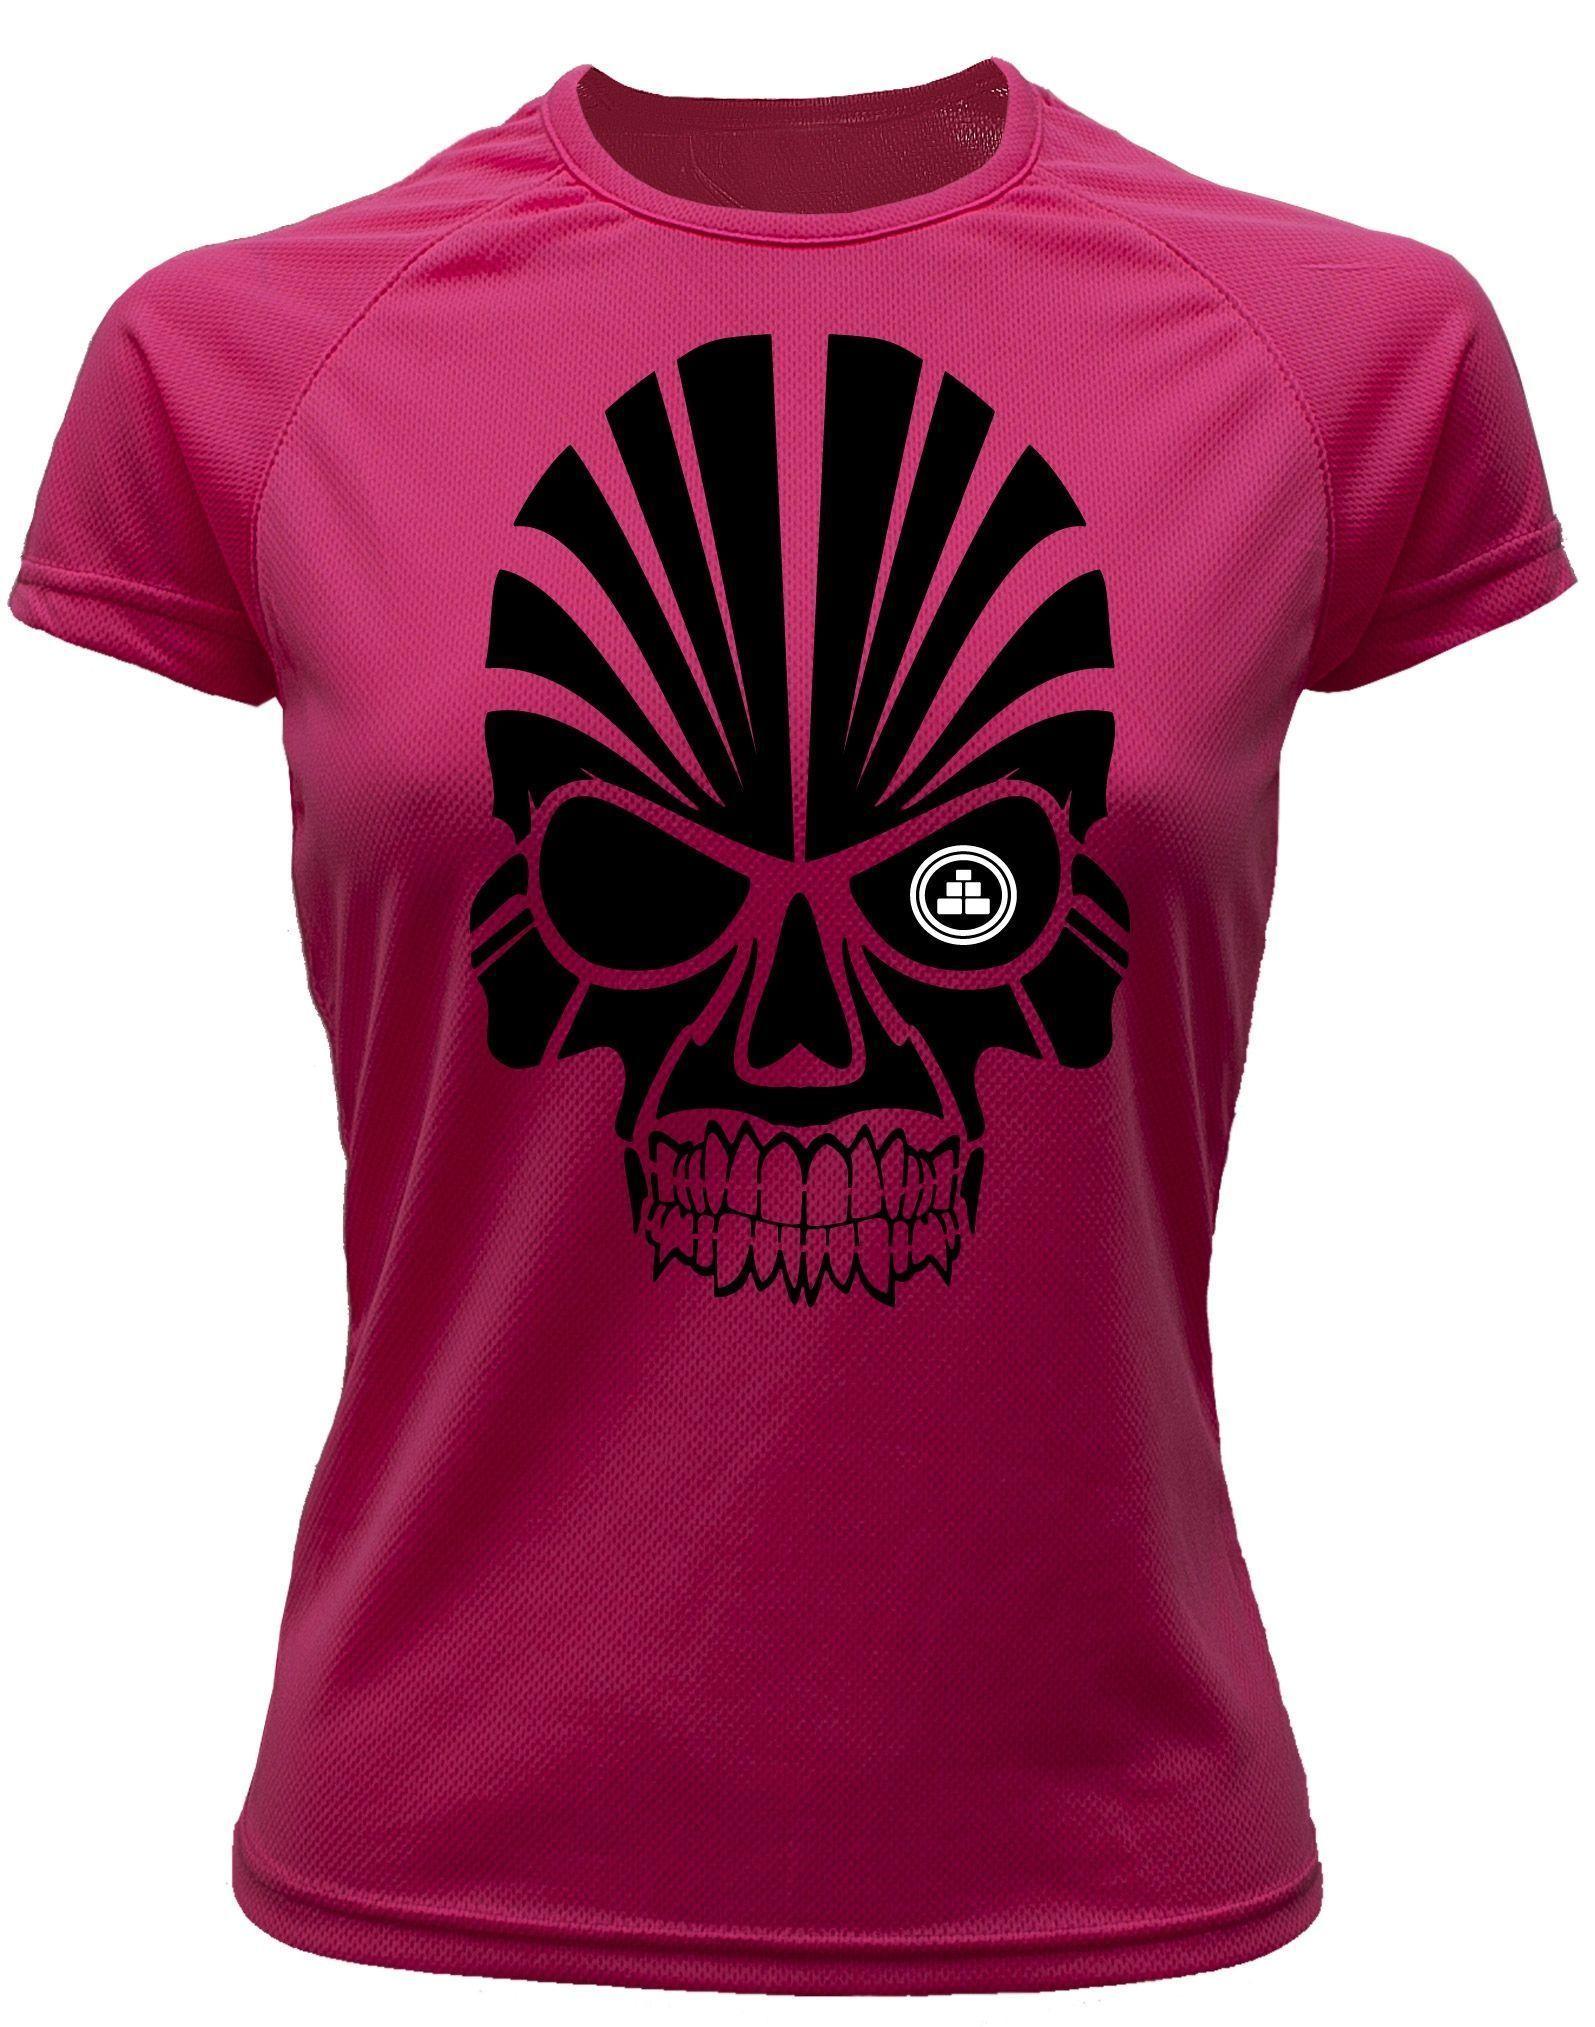 Camiseta deportiva Mujer calavera Rosa